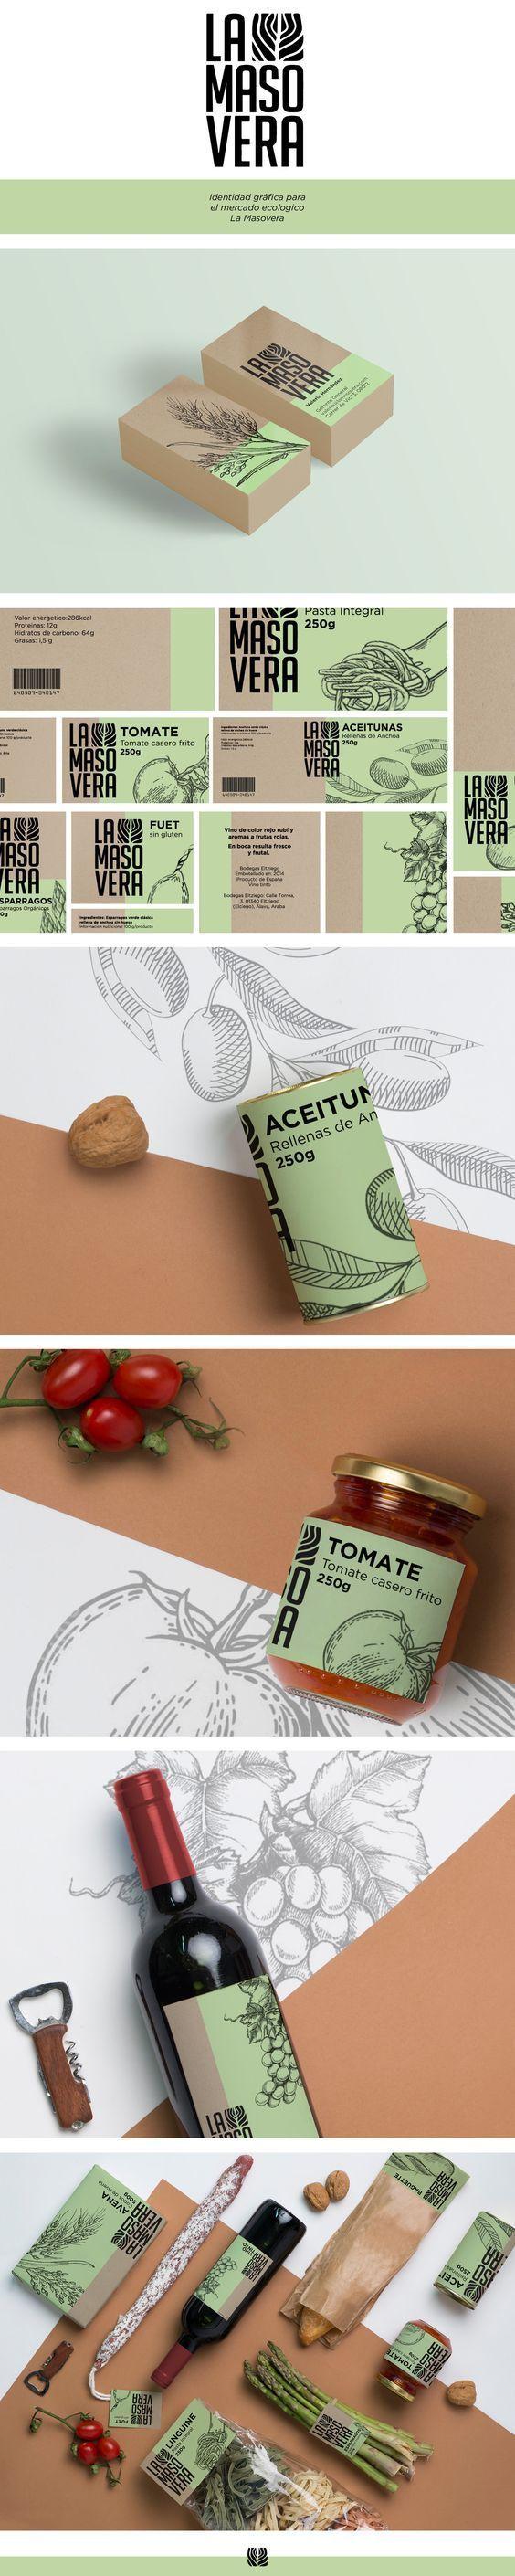 La Masovera Food Branding and Packaging by Valeria Hernandez | Fivestar Branding Agency – Design and Branding Agency